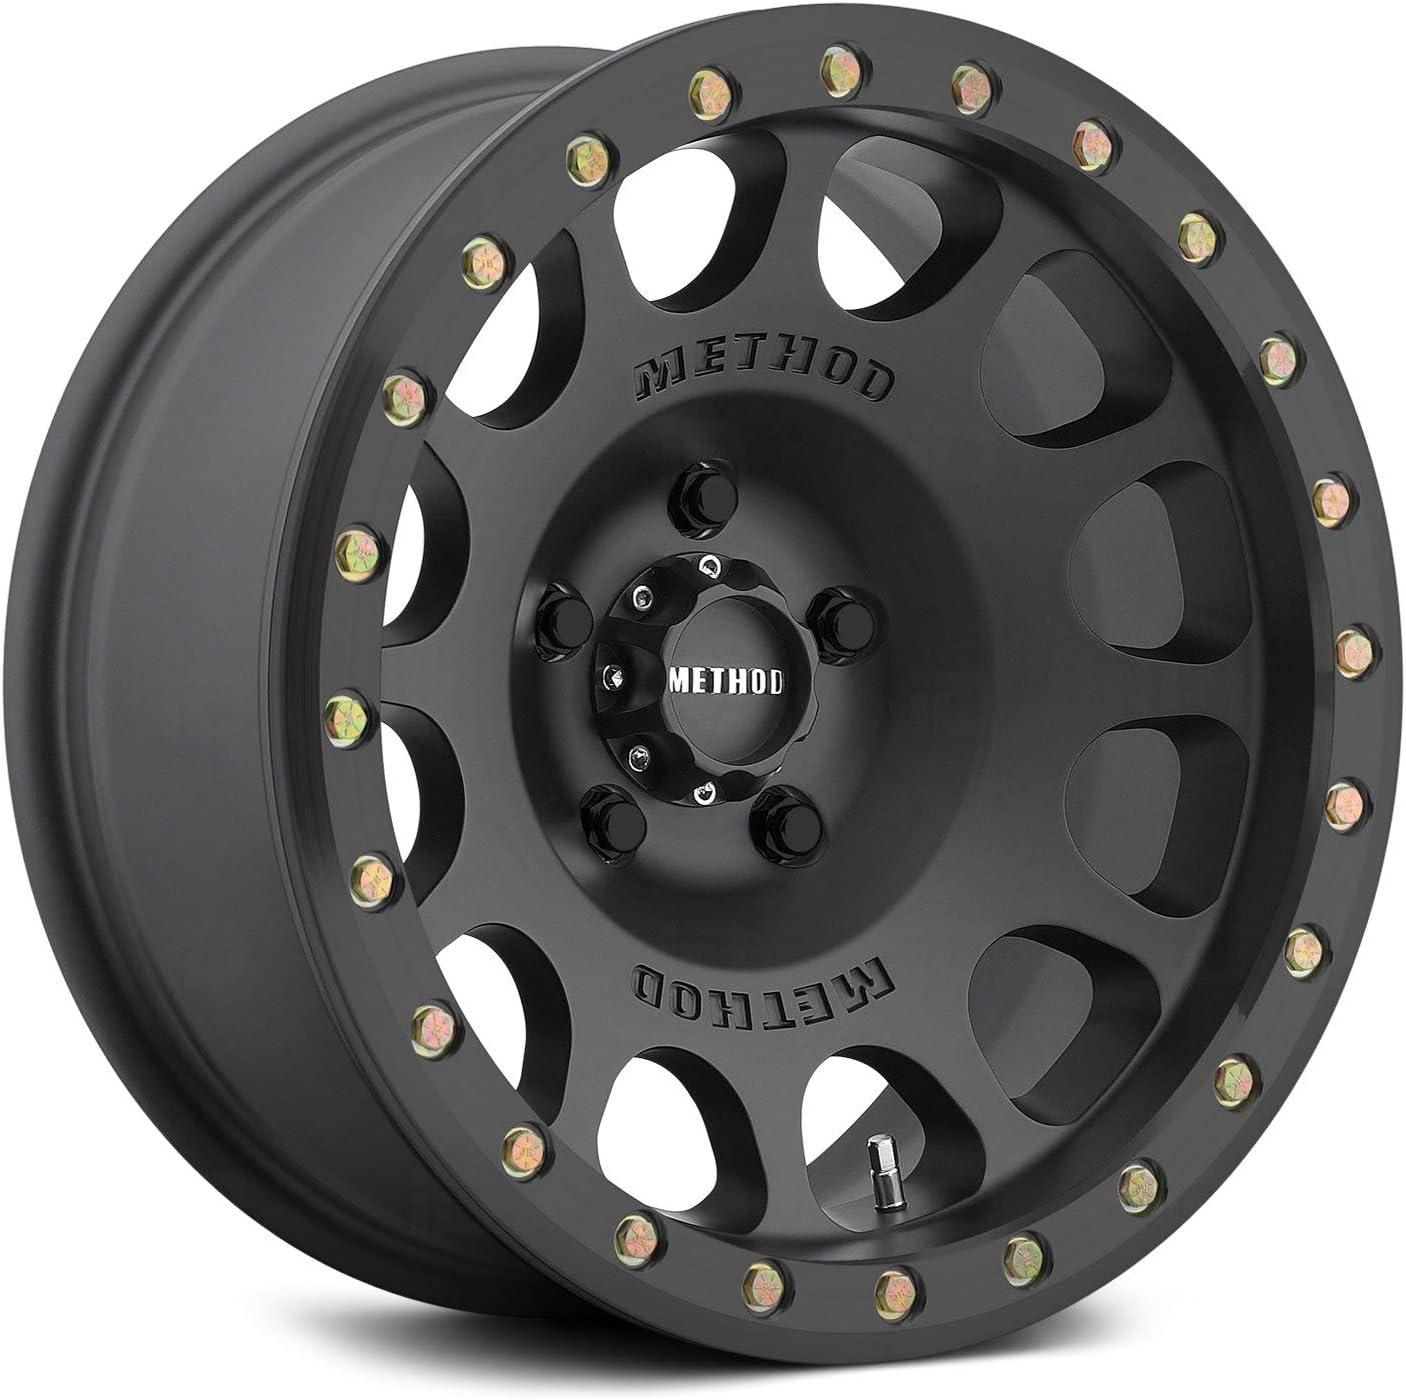 Method Race Wheels 105 Beadlock Matte High quality Manufacturer OFFicial shop Off 38mm 17x9 Black 5x4.5